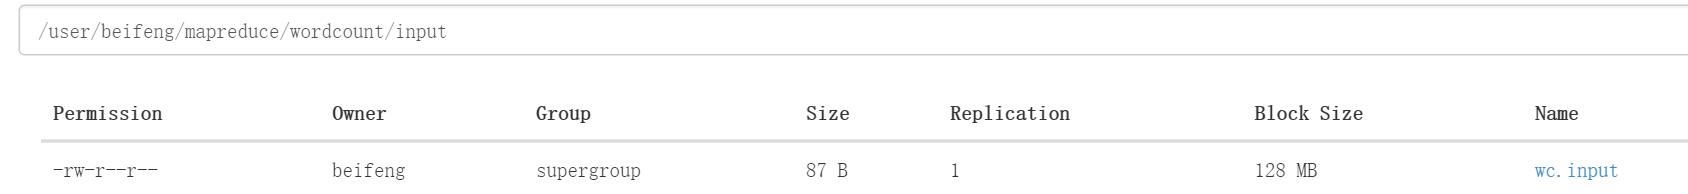 f1.png-22.7kB